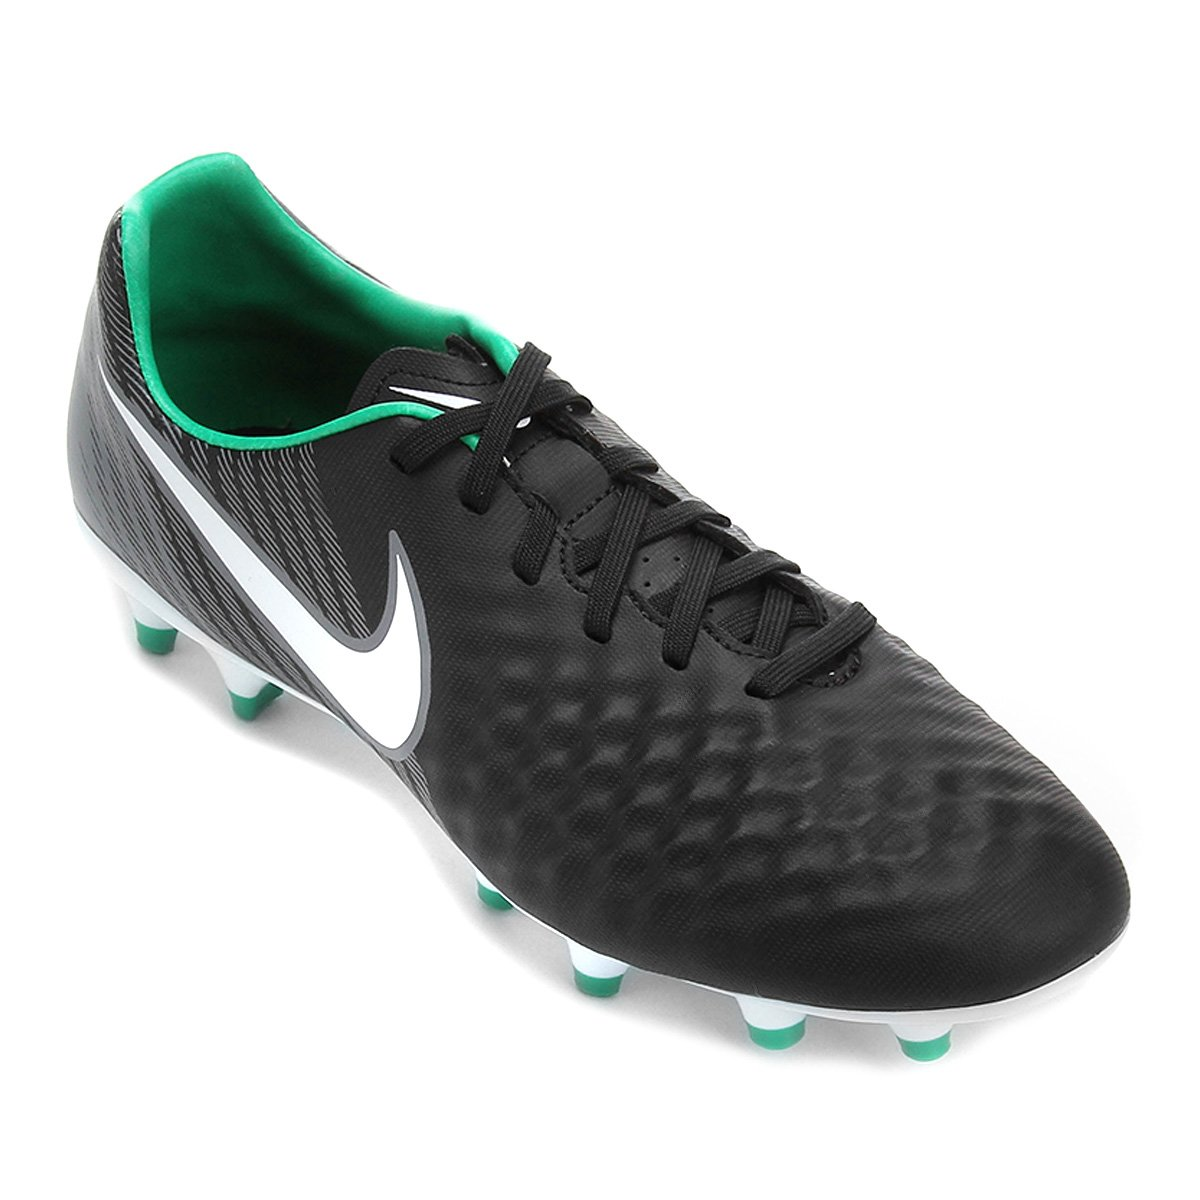 Chuteira Campo Nike Magista Onda II FG - Compre Agora  36b4643b781b0